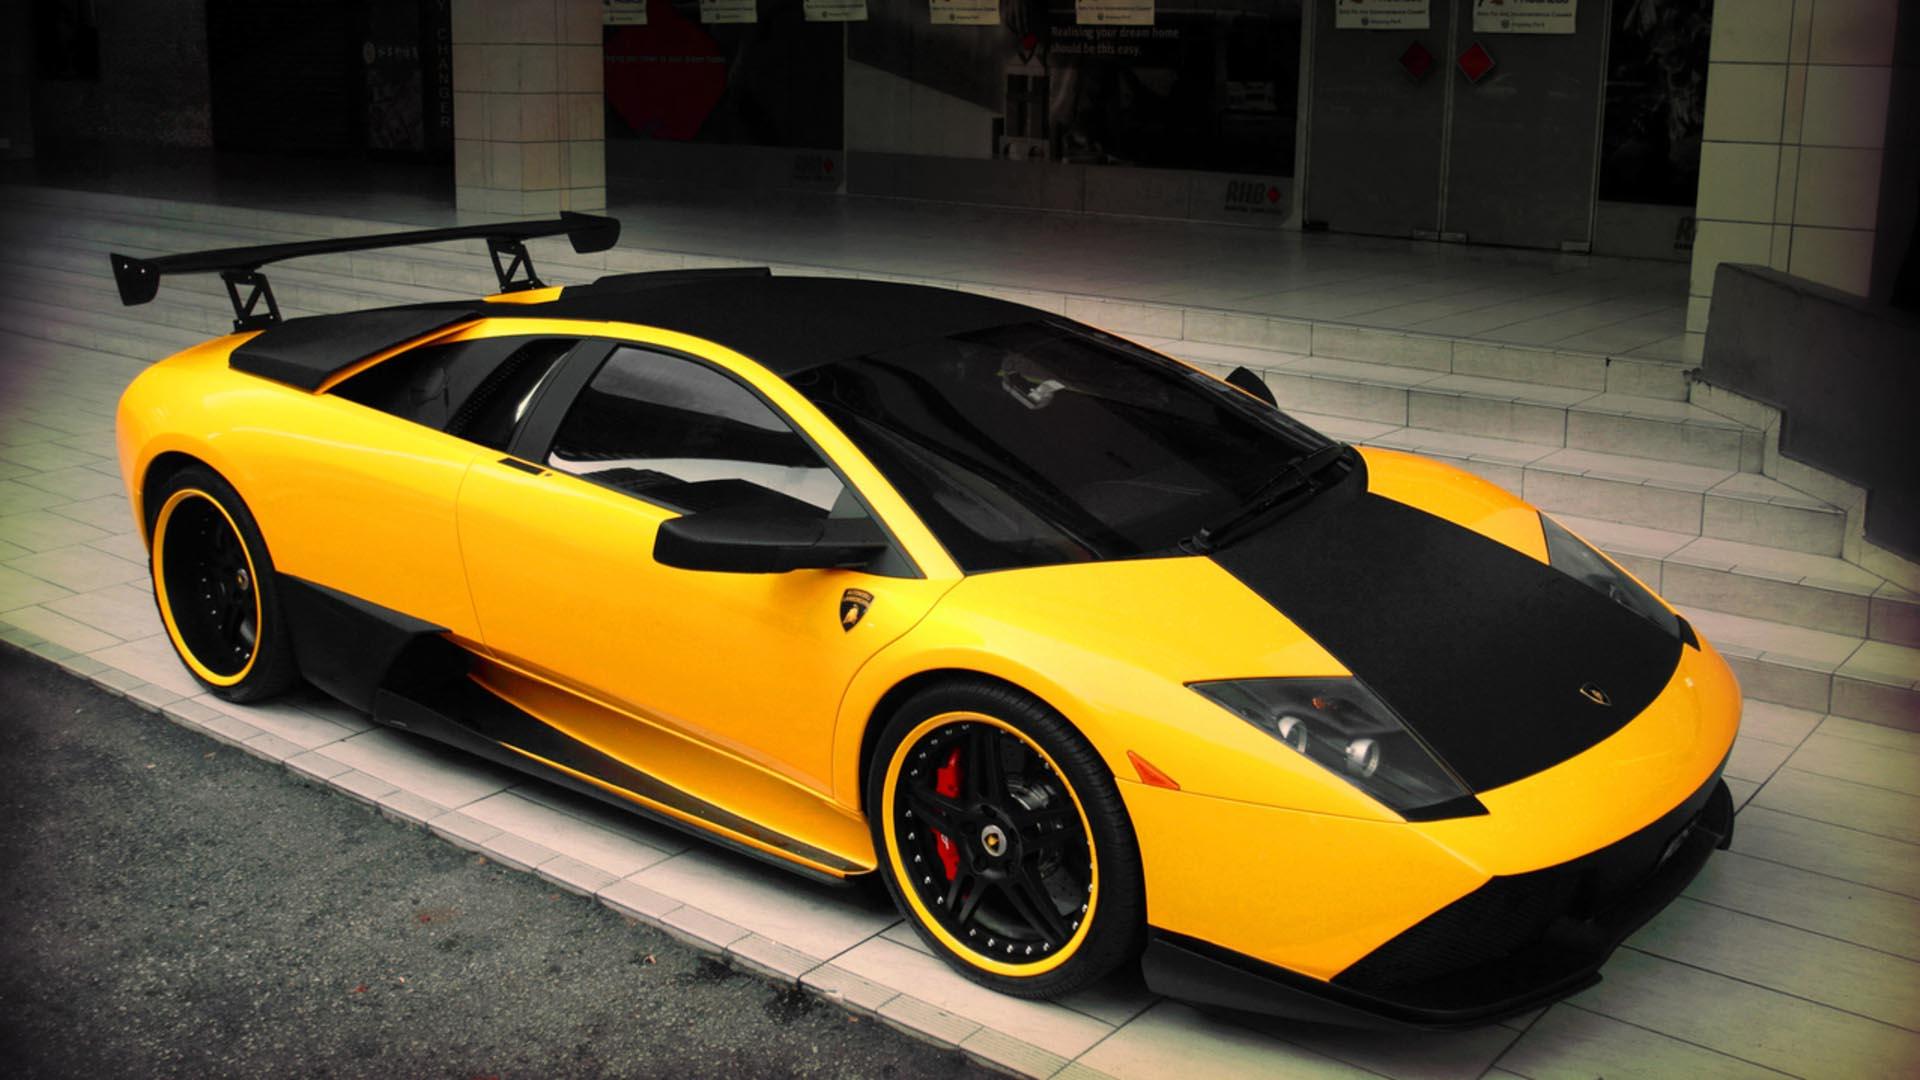 Cool Yellow Lamborghini Wallpaper 35095 1920x1080px 1920x1080